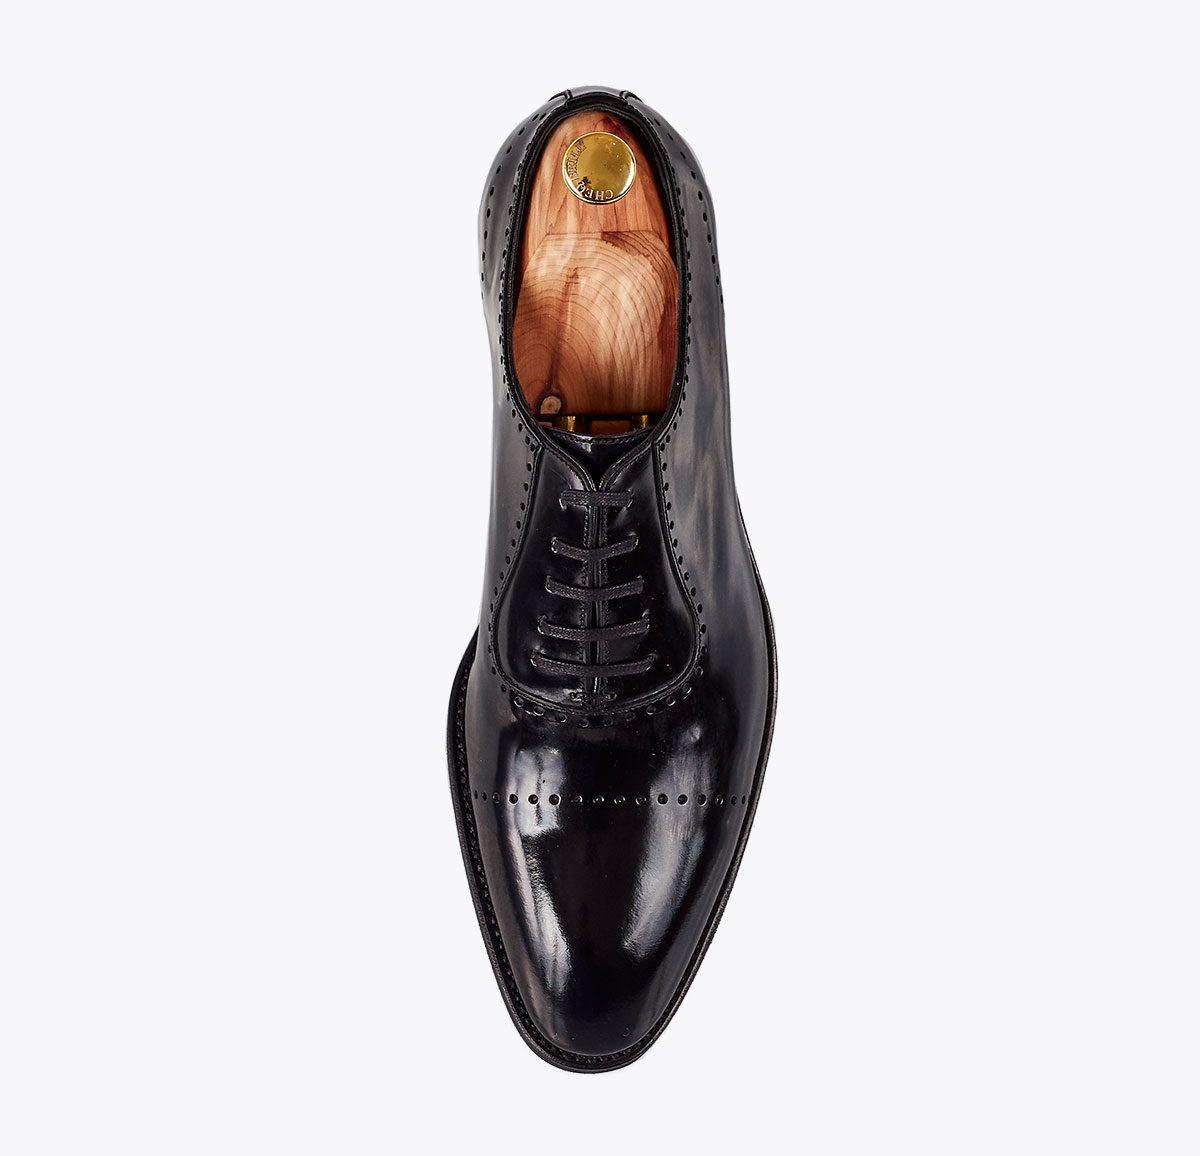 Zapato titanic negro hecho a mano en mandalashoes, Santanyí Mallorca. Hand made shoes. Nach Mass Schuhe